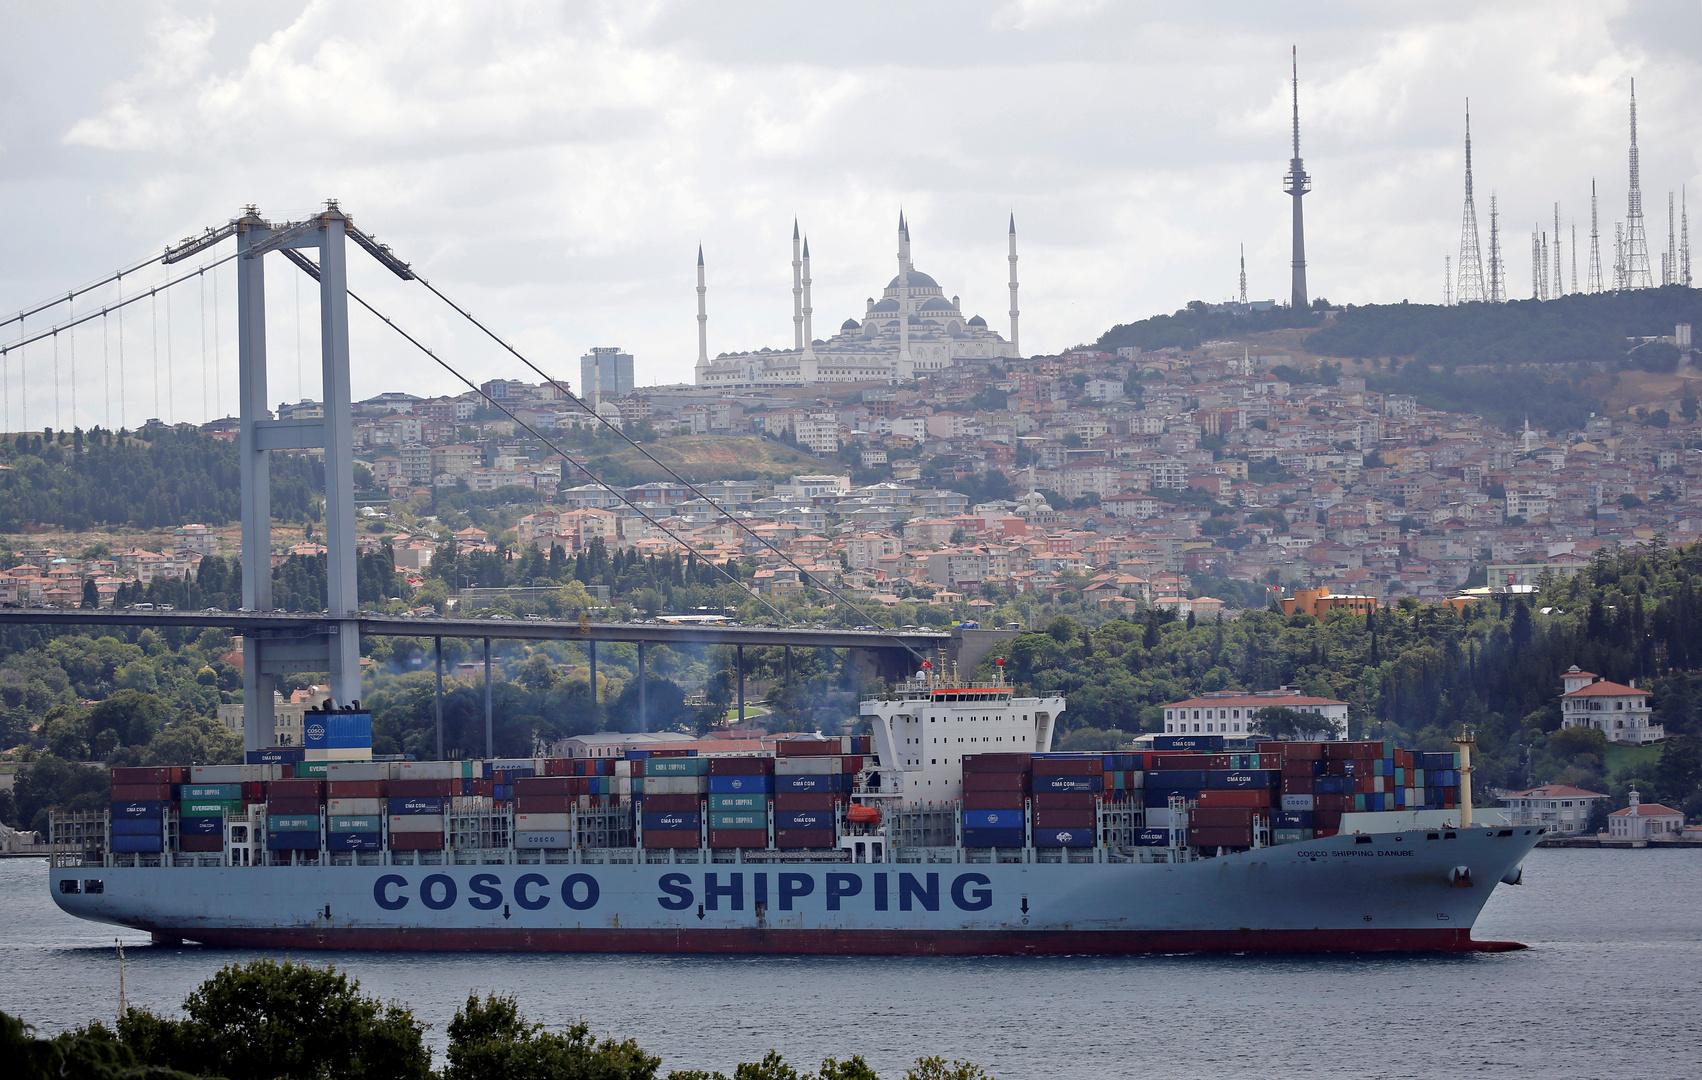 تفاصيل مشروع قناة اسطنبول (صور)